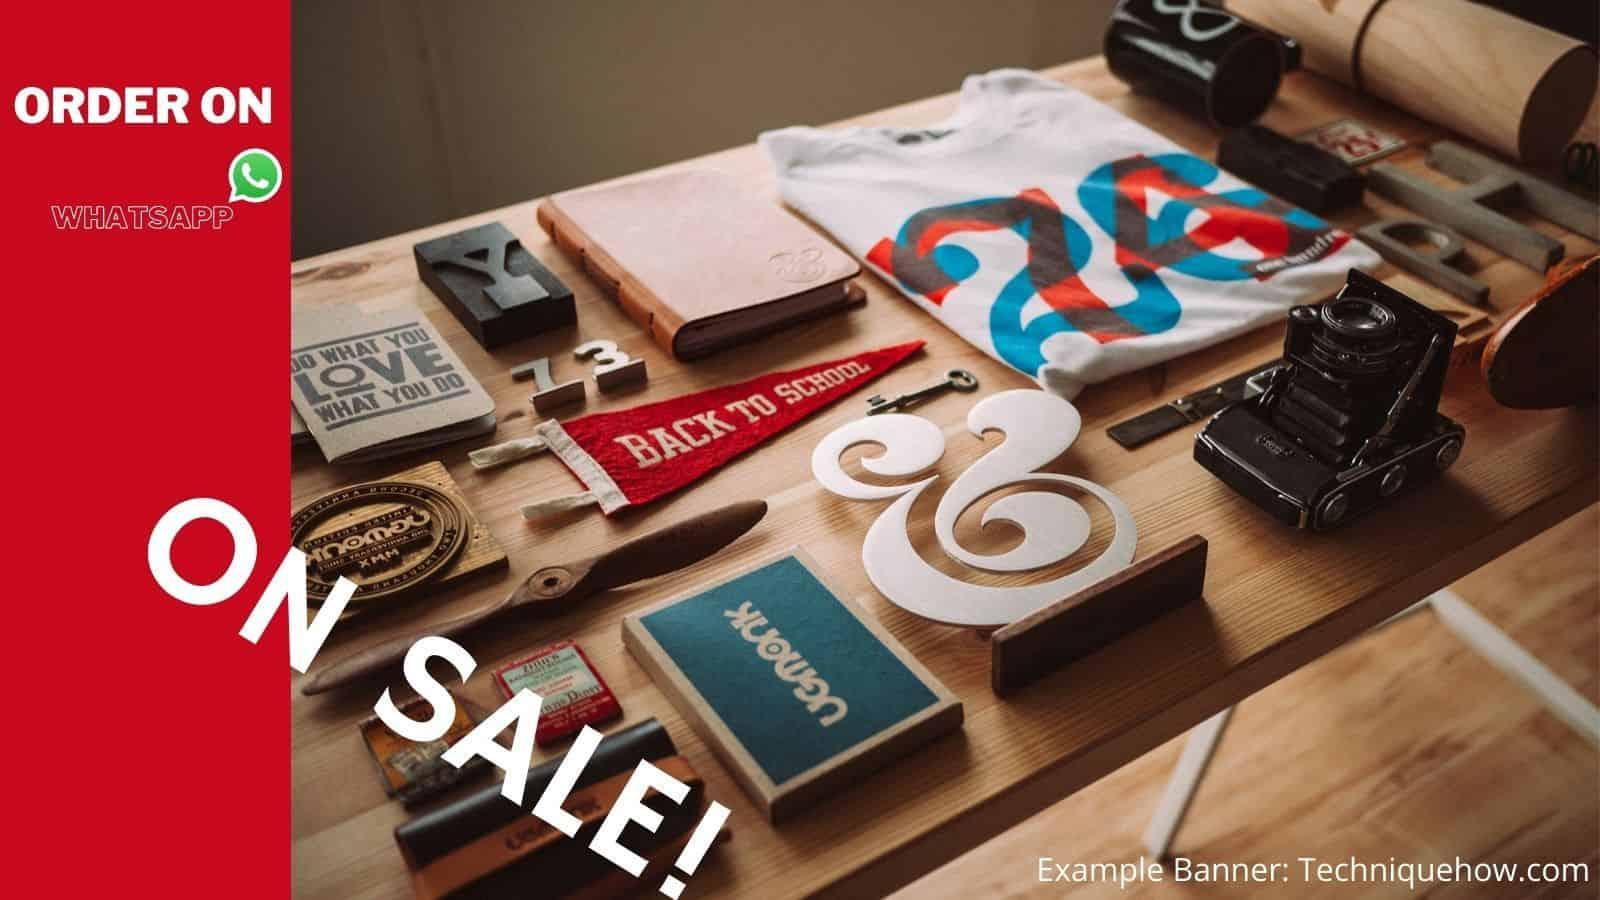 whatsapp group sale